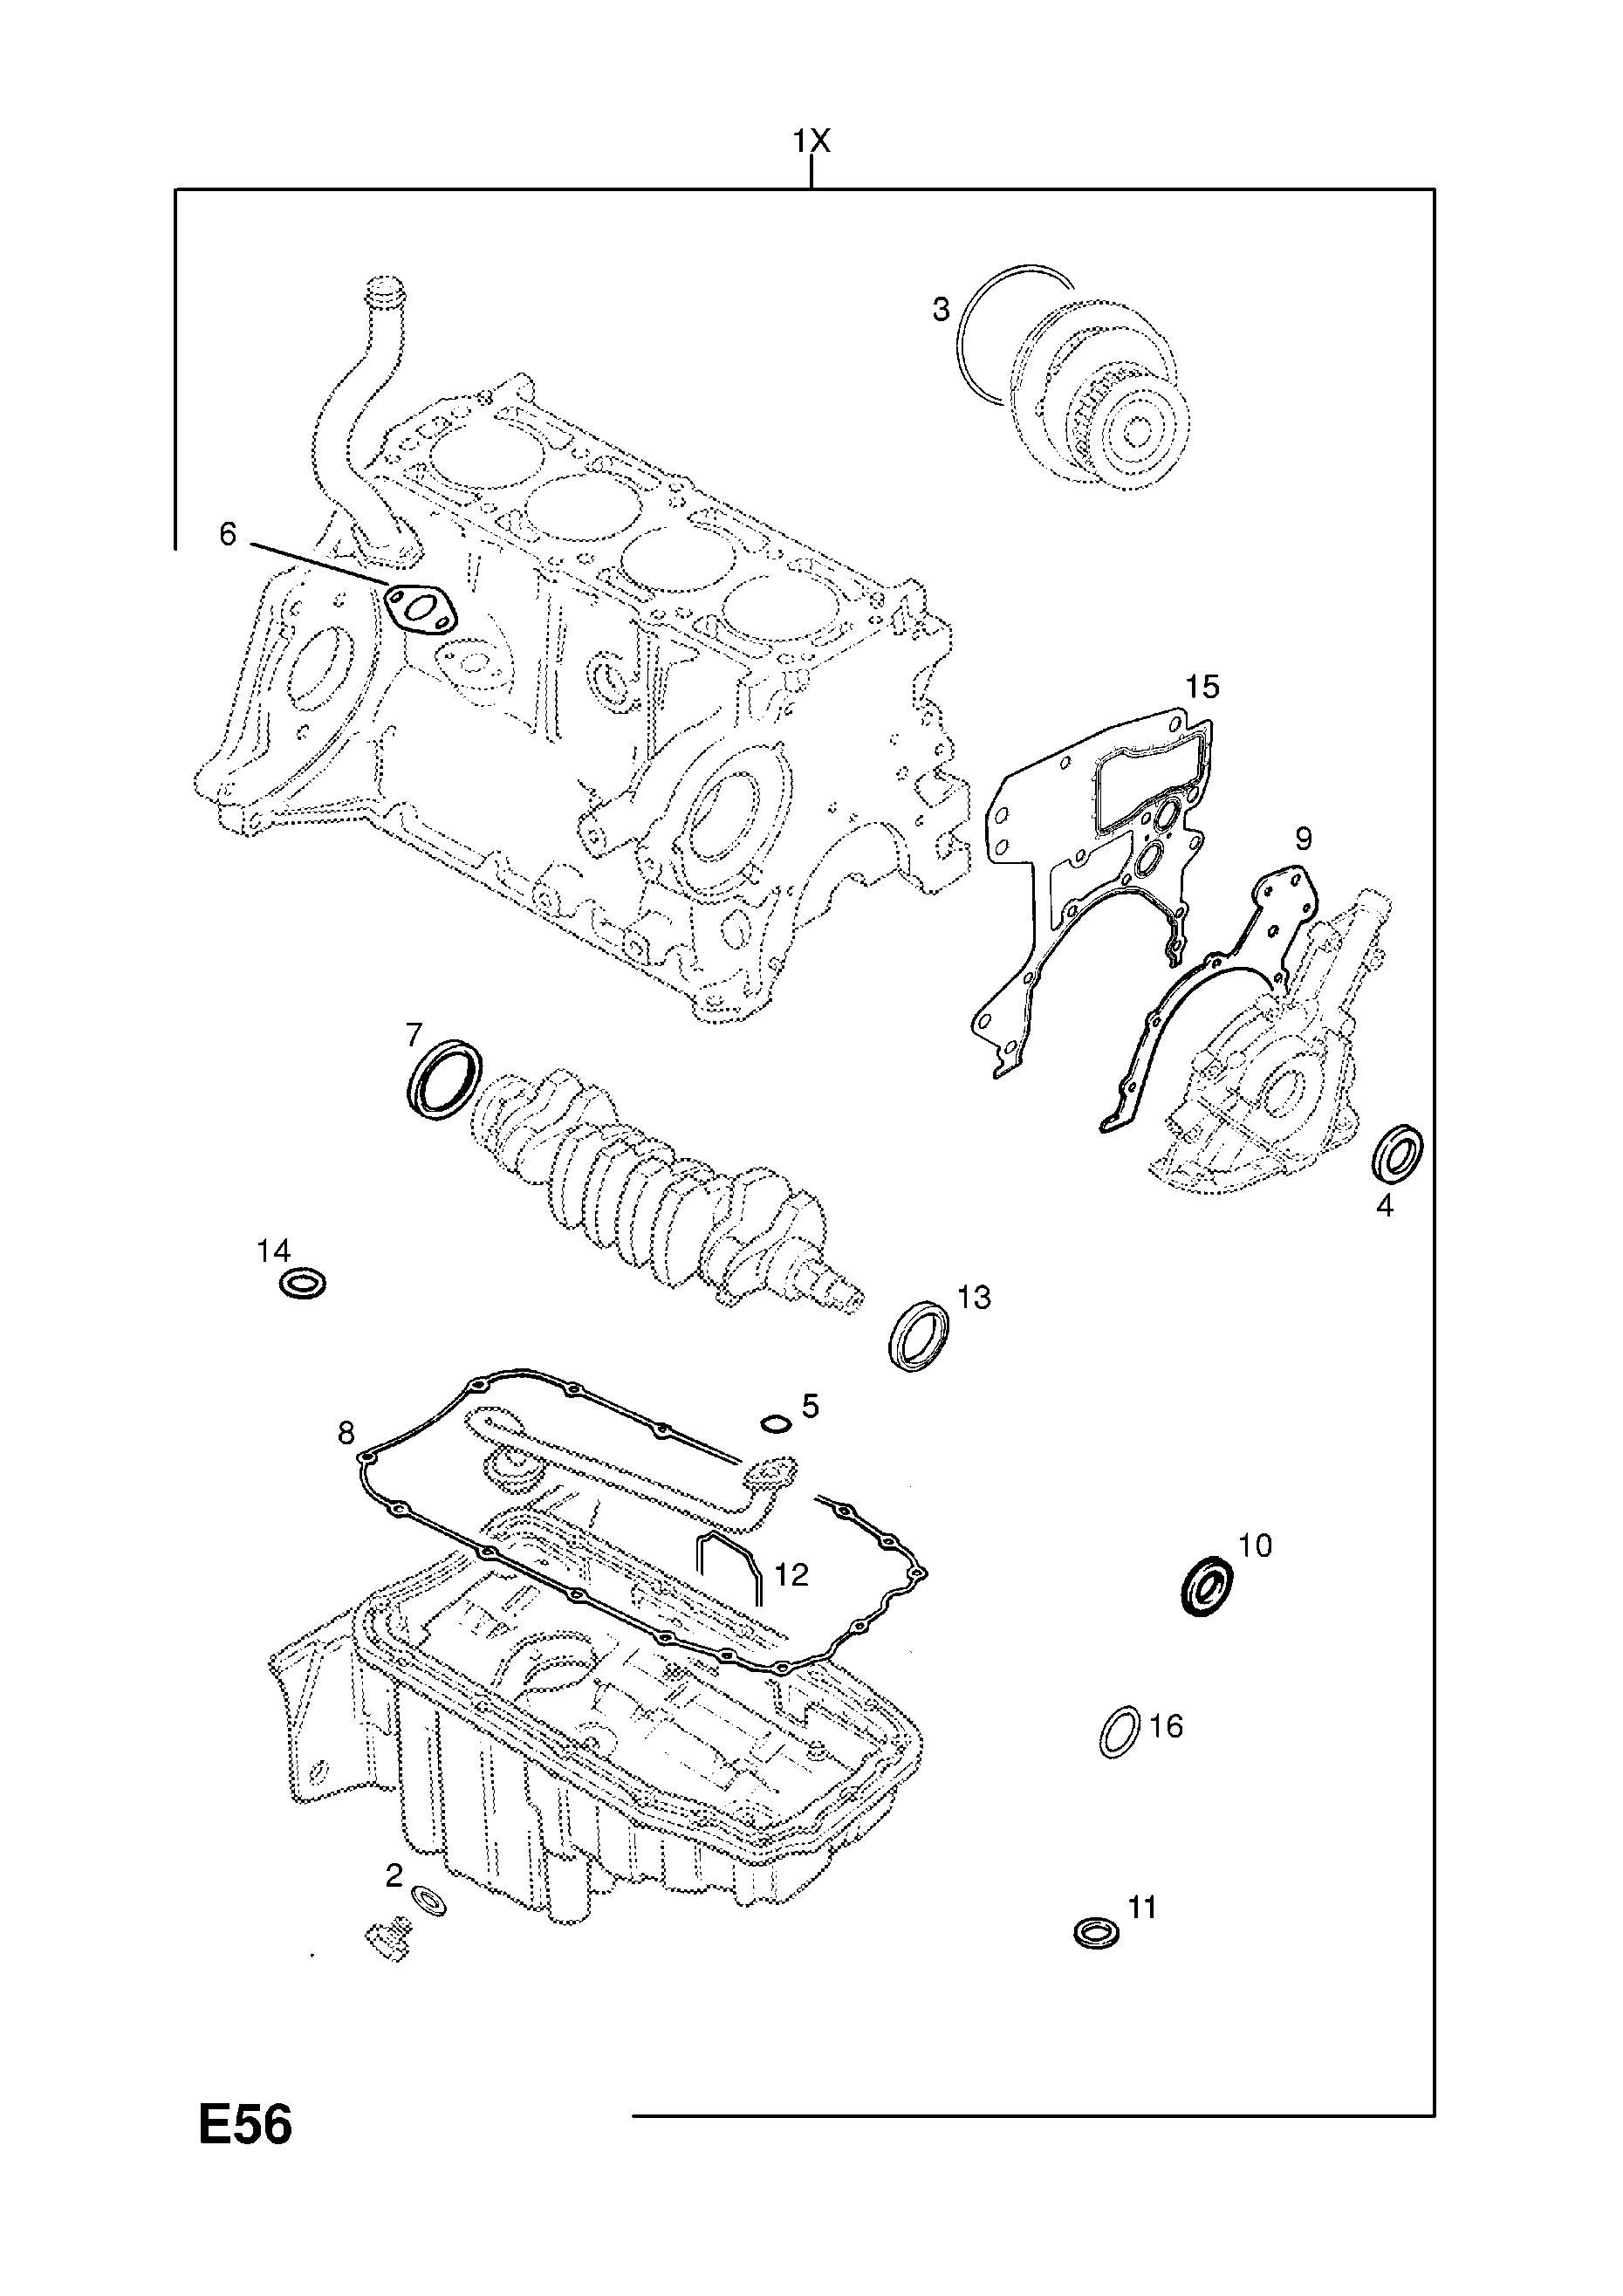 opel zafira a 1998 2010 e engine and clutch 7 x16xel l91 Fiat Stilo Fuse Box list of parts